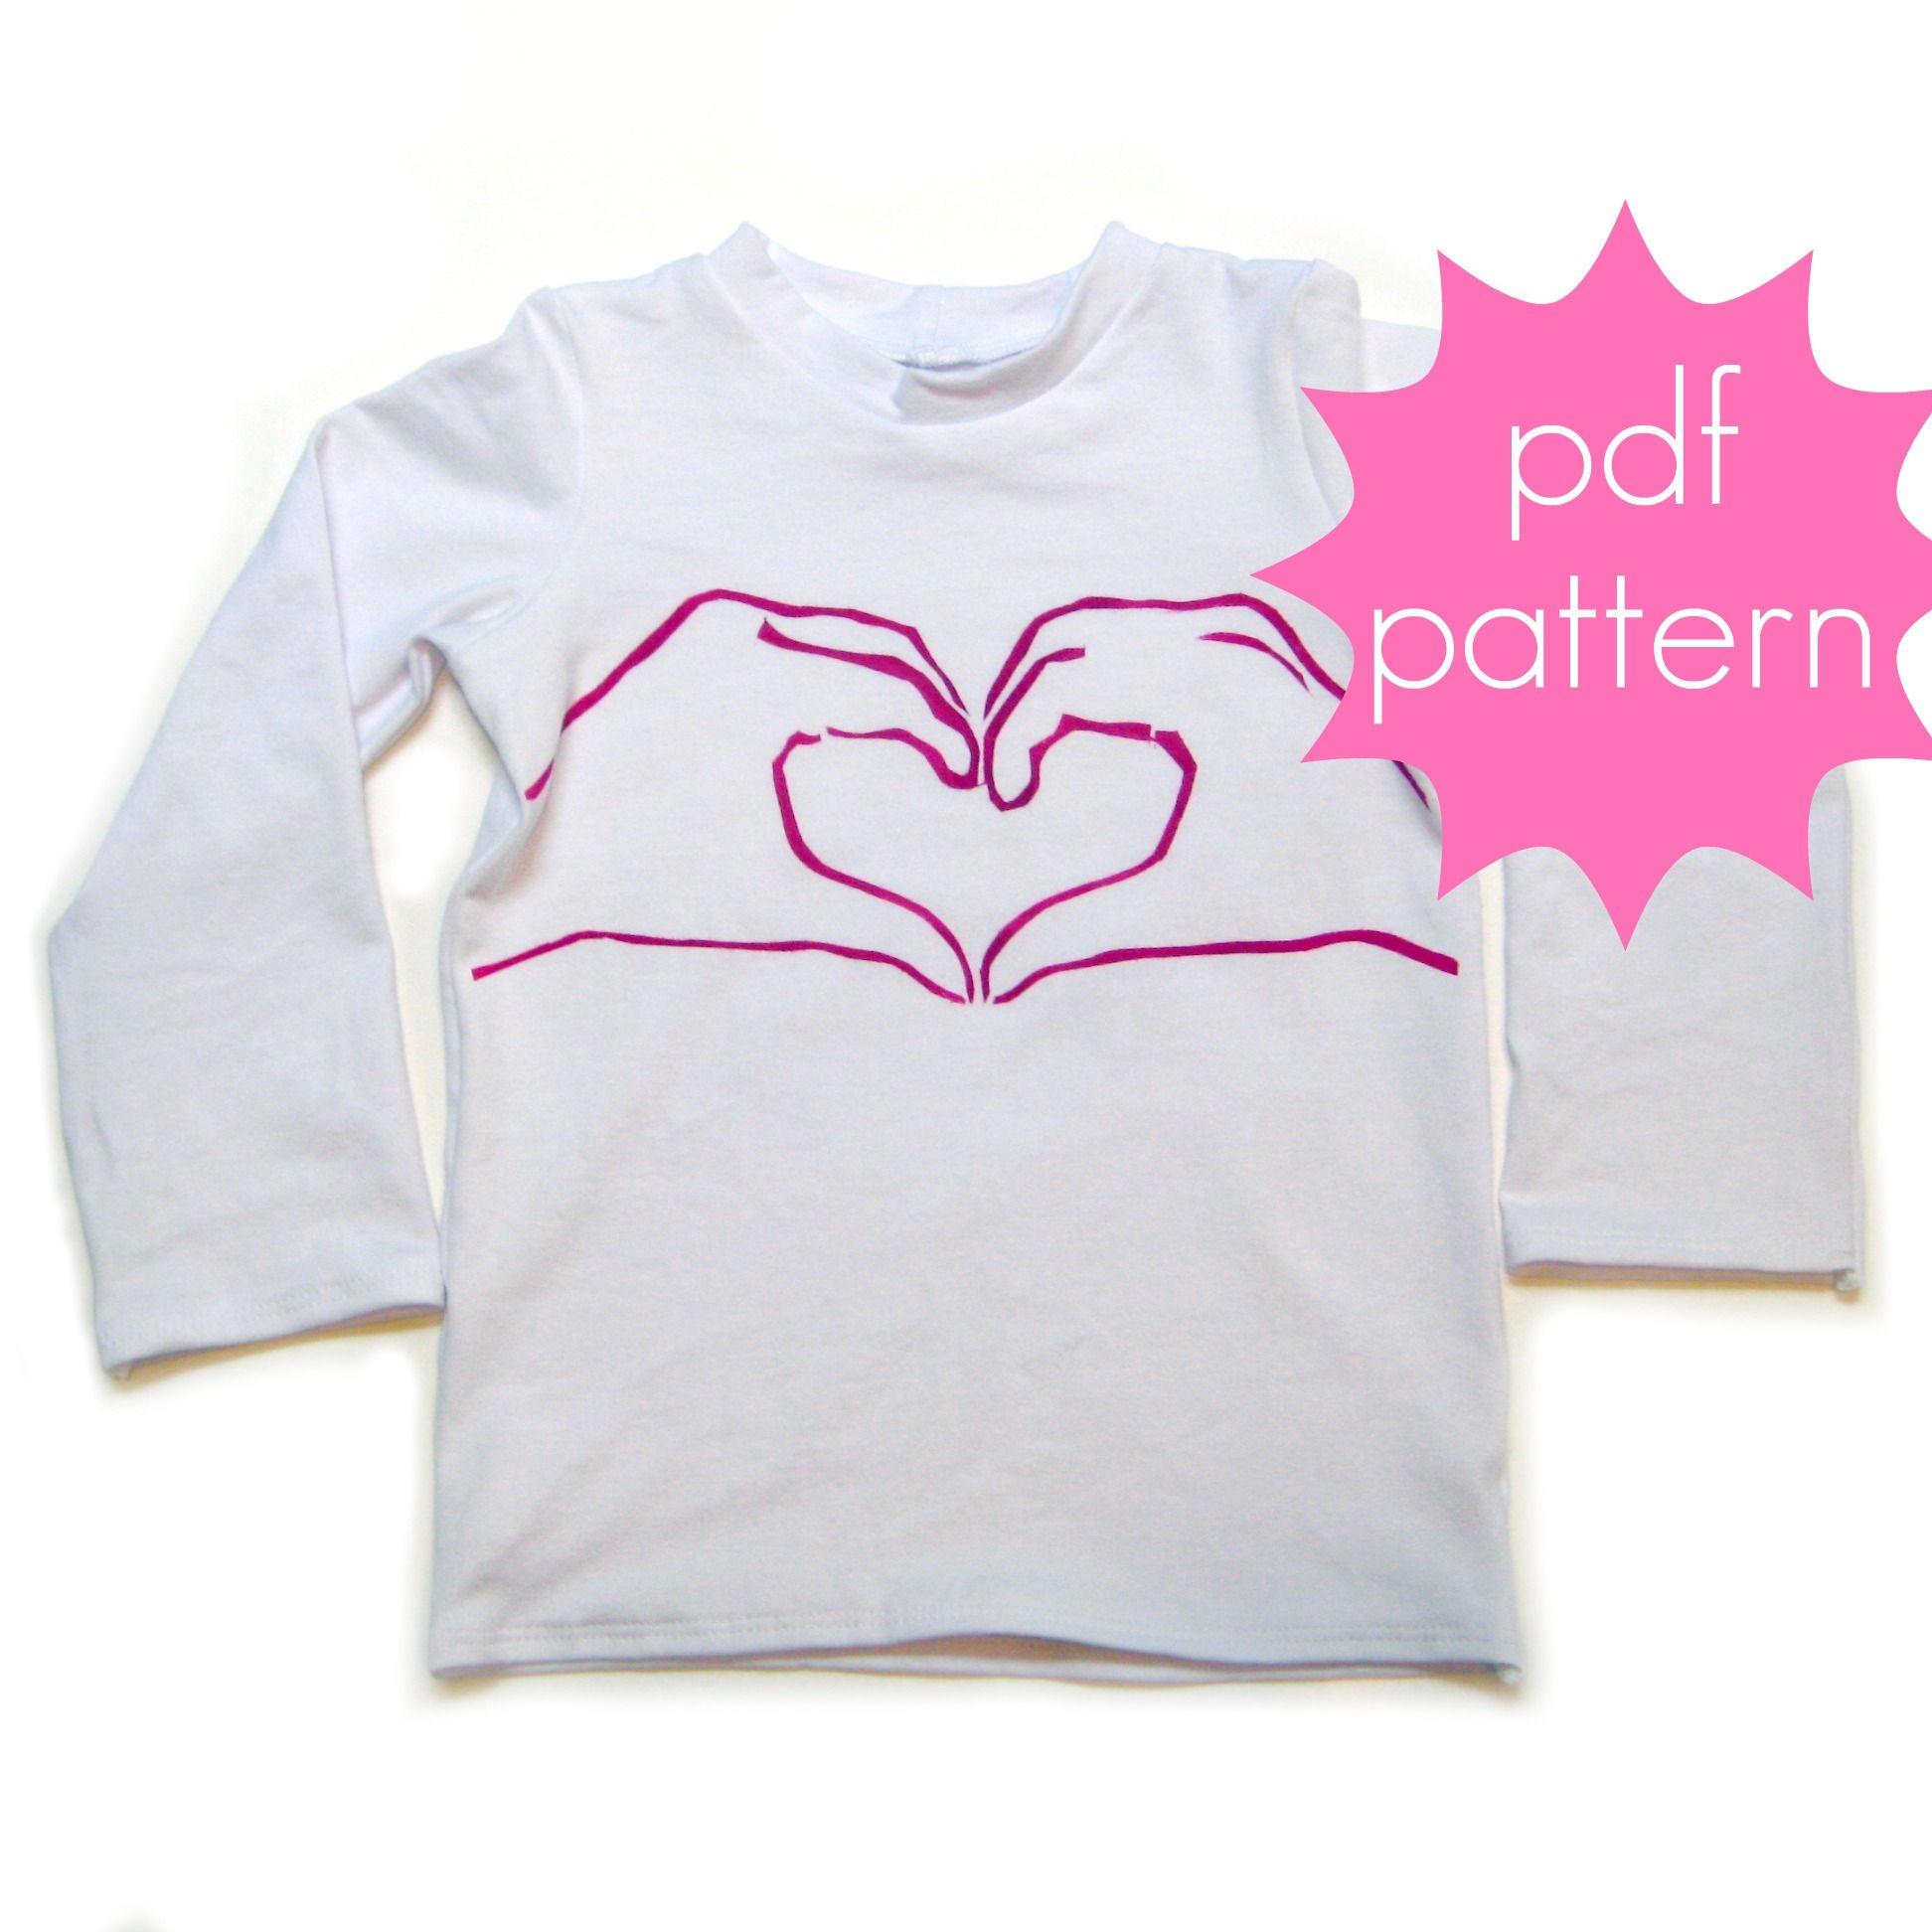 Jocole Classic Knit Tee Sewing patterns, Knit tees